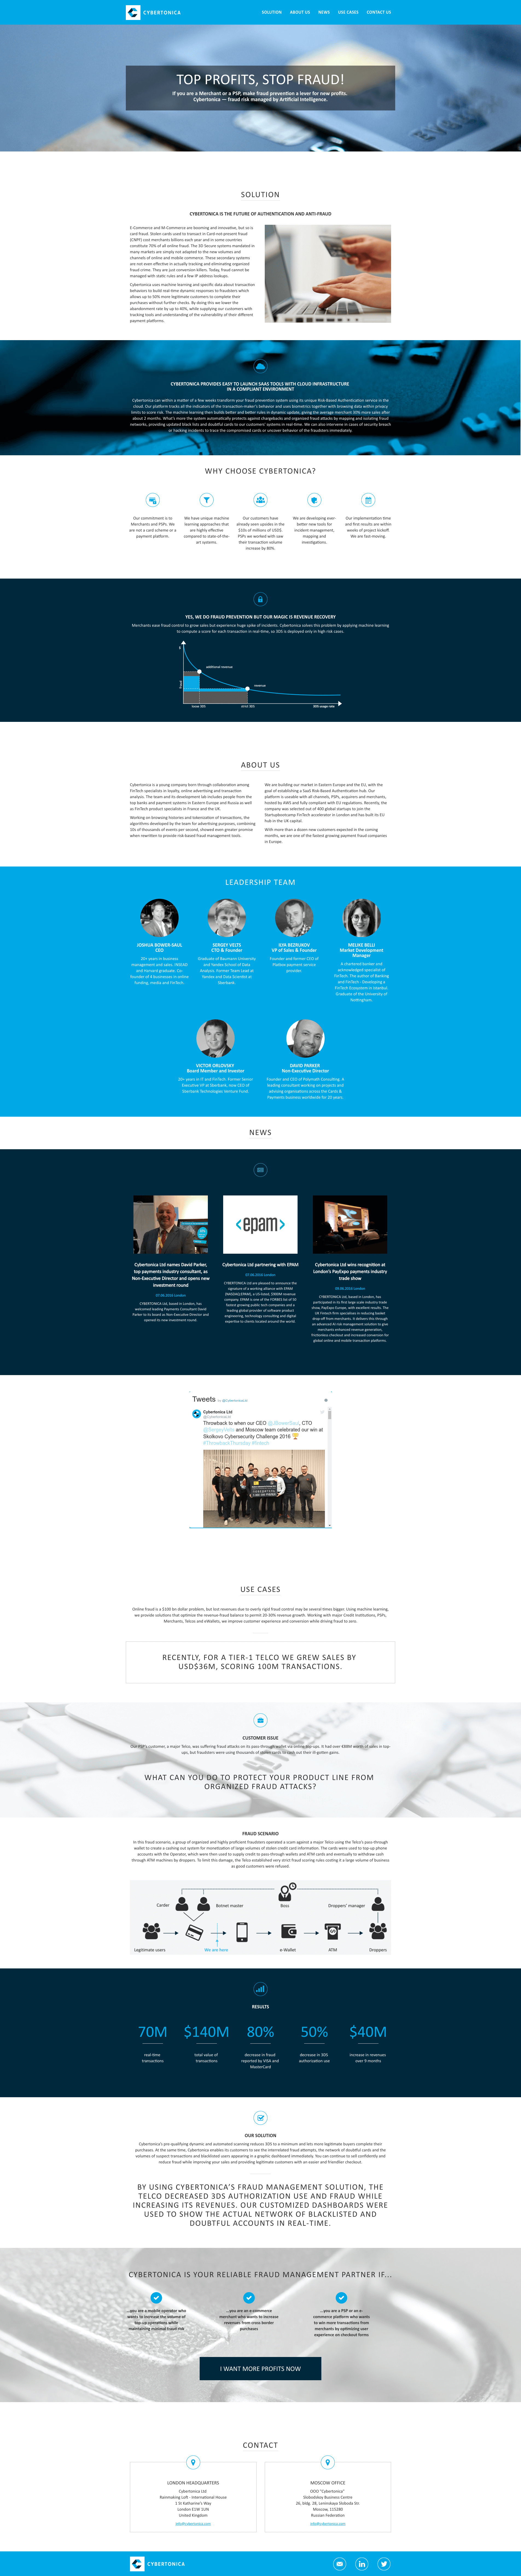 screenshot--2018.05.13-13-24-07 (1)